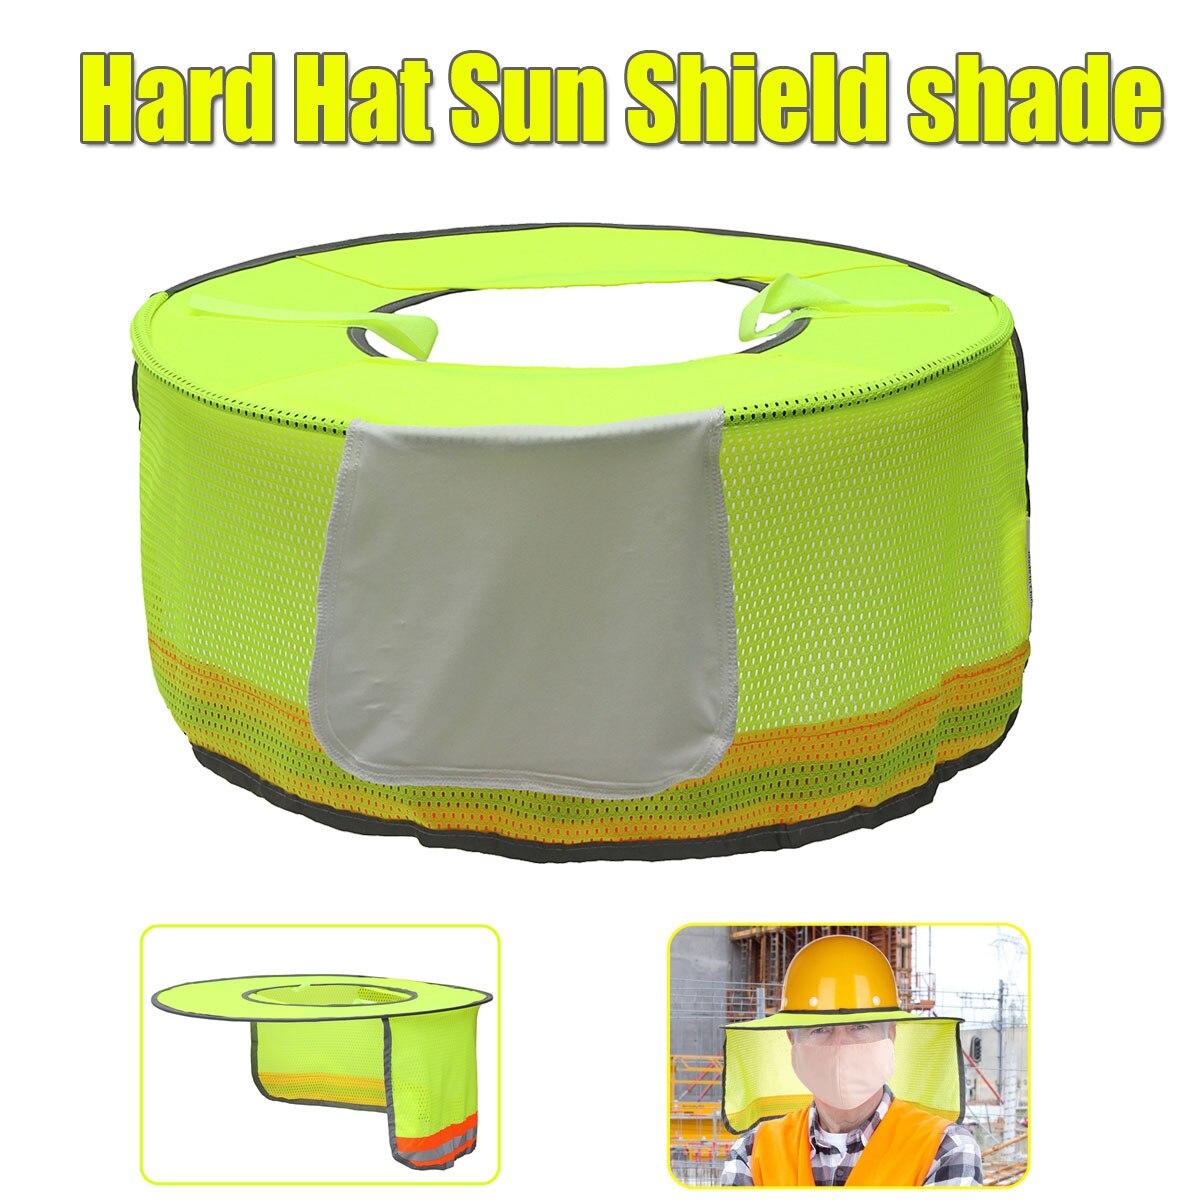 bf568b5d80c Detail Feedback Questions about Hard Hat Sun Shield Shade Full Brim Sun  Shield Shade Head Neck Nape Breathable Mesh For Hard Hat Helmet on  Aliexpress.com ...